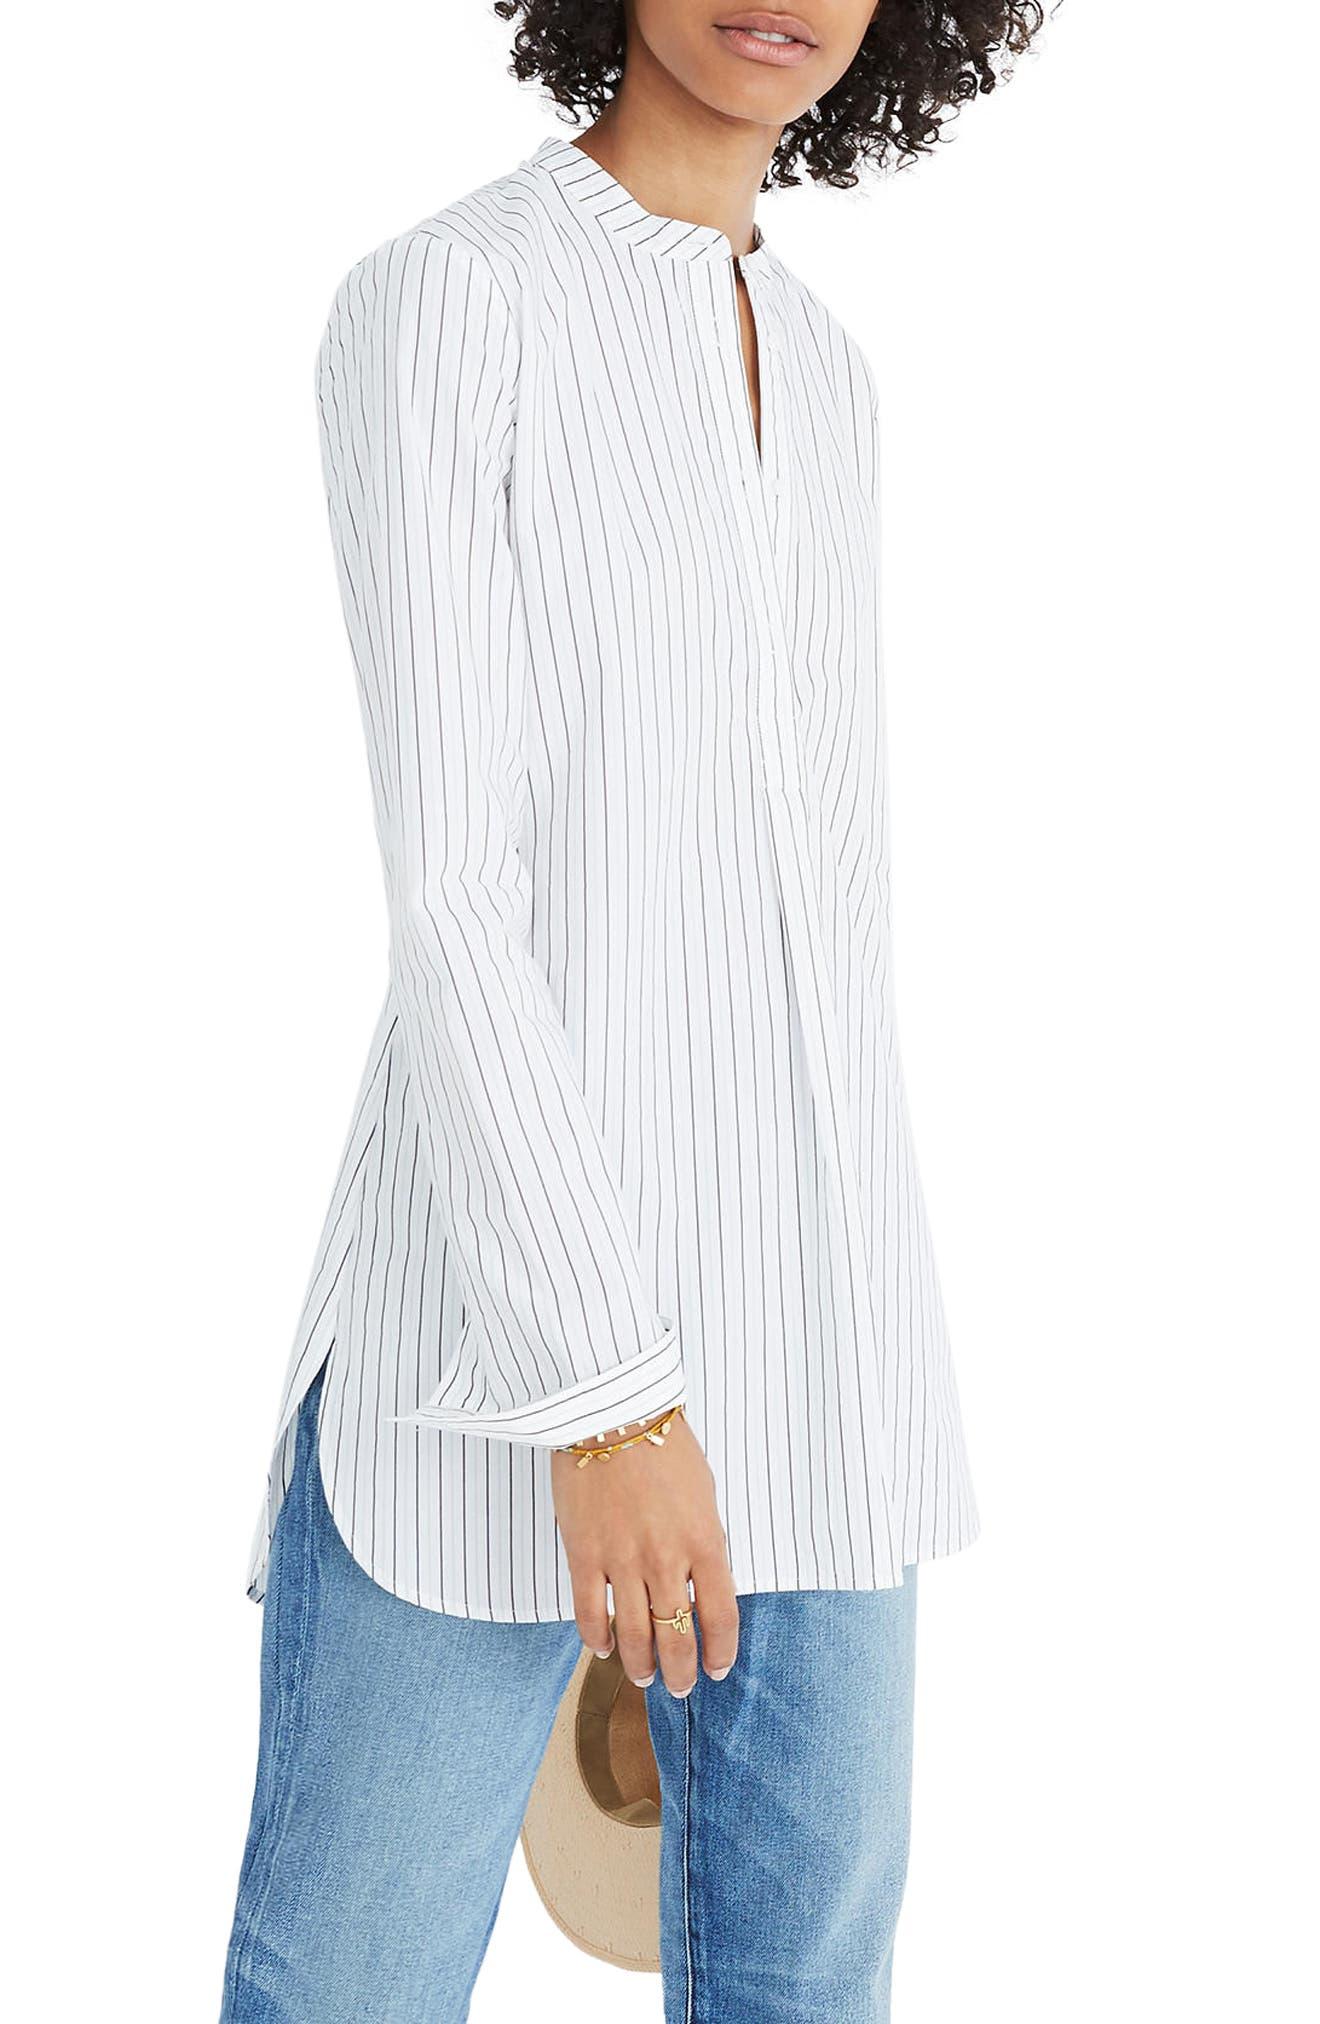 Wellspring Stripe Tunic Popover Shirt,                             Main thumbnail 1, color,                             White Wash